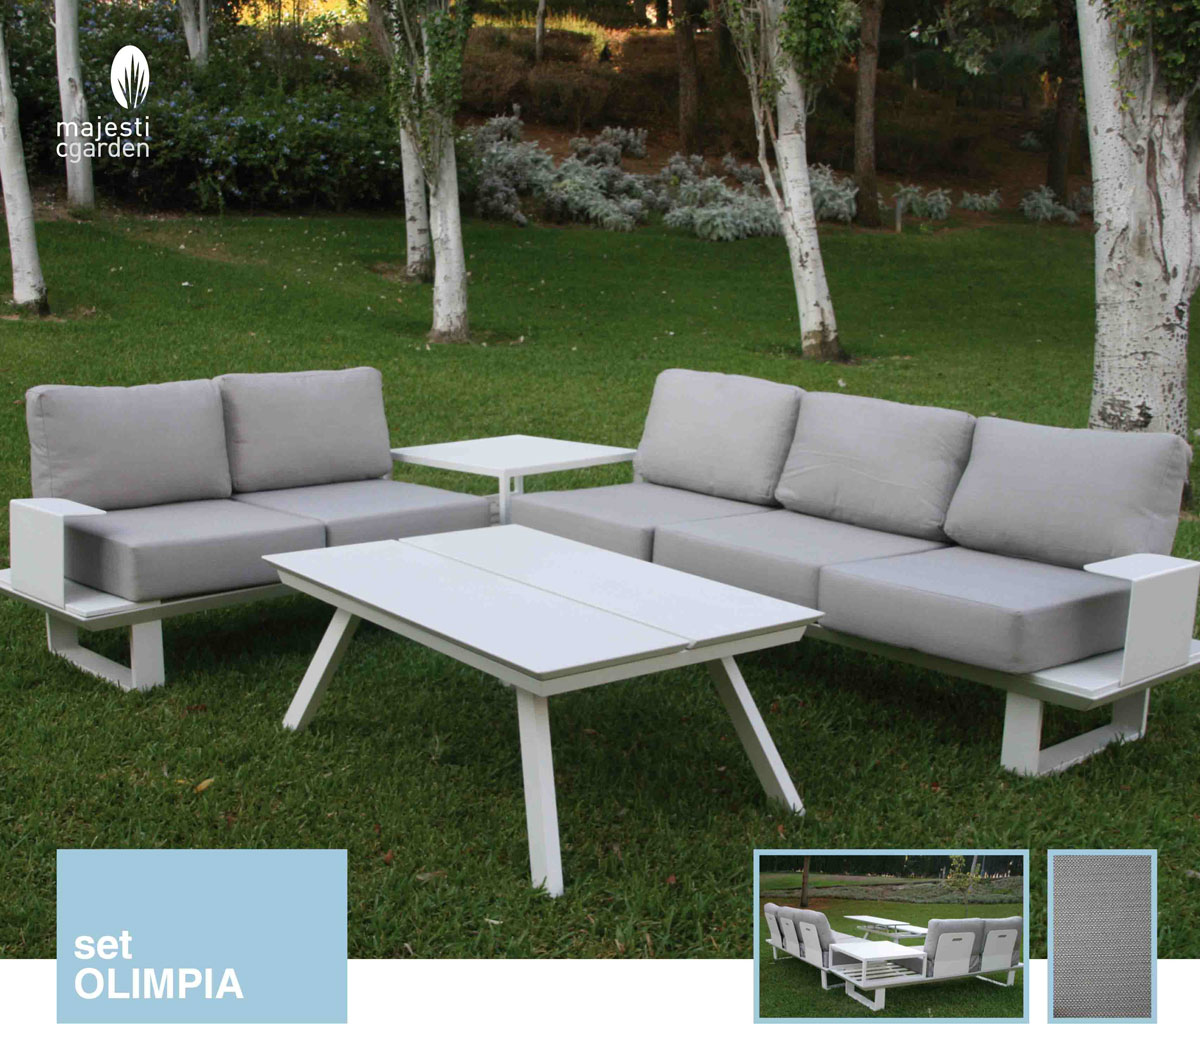 Set de sofá para exterior Olimpia de aluminio